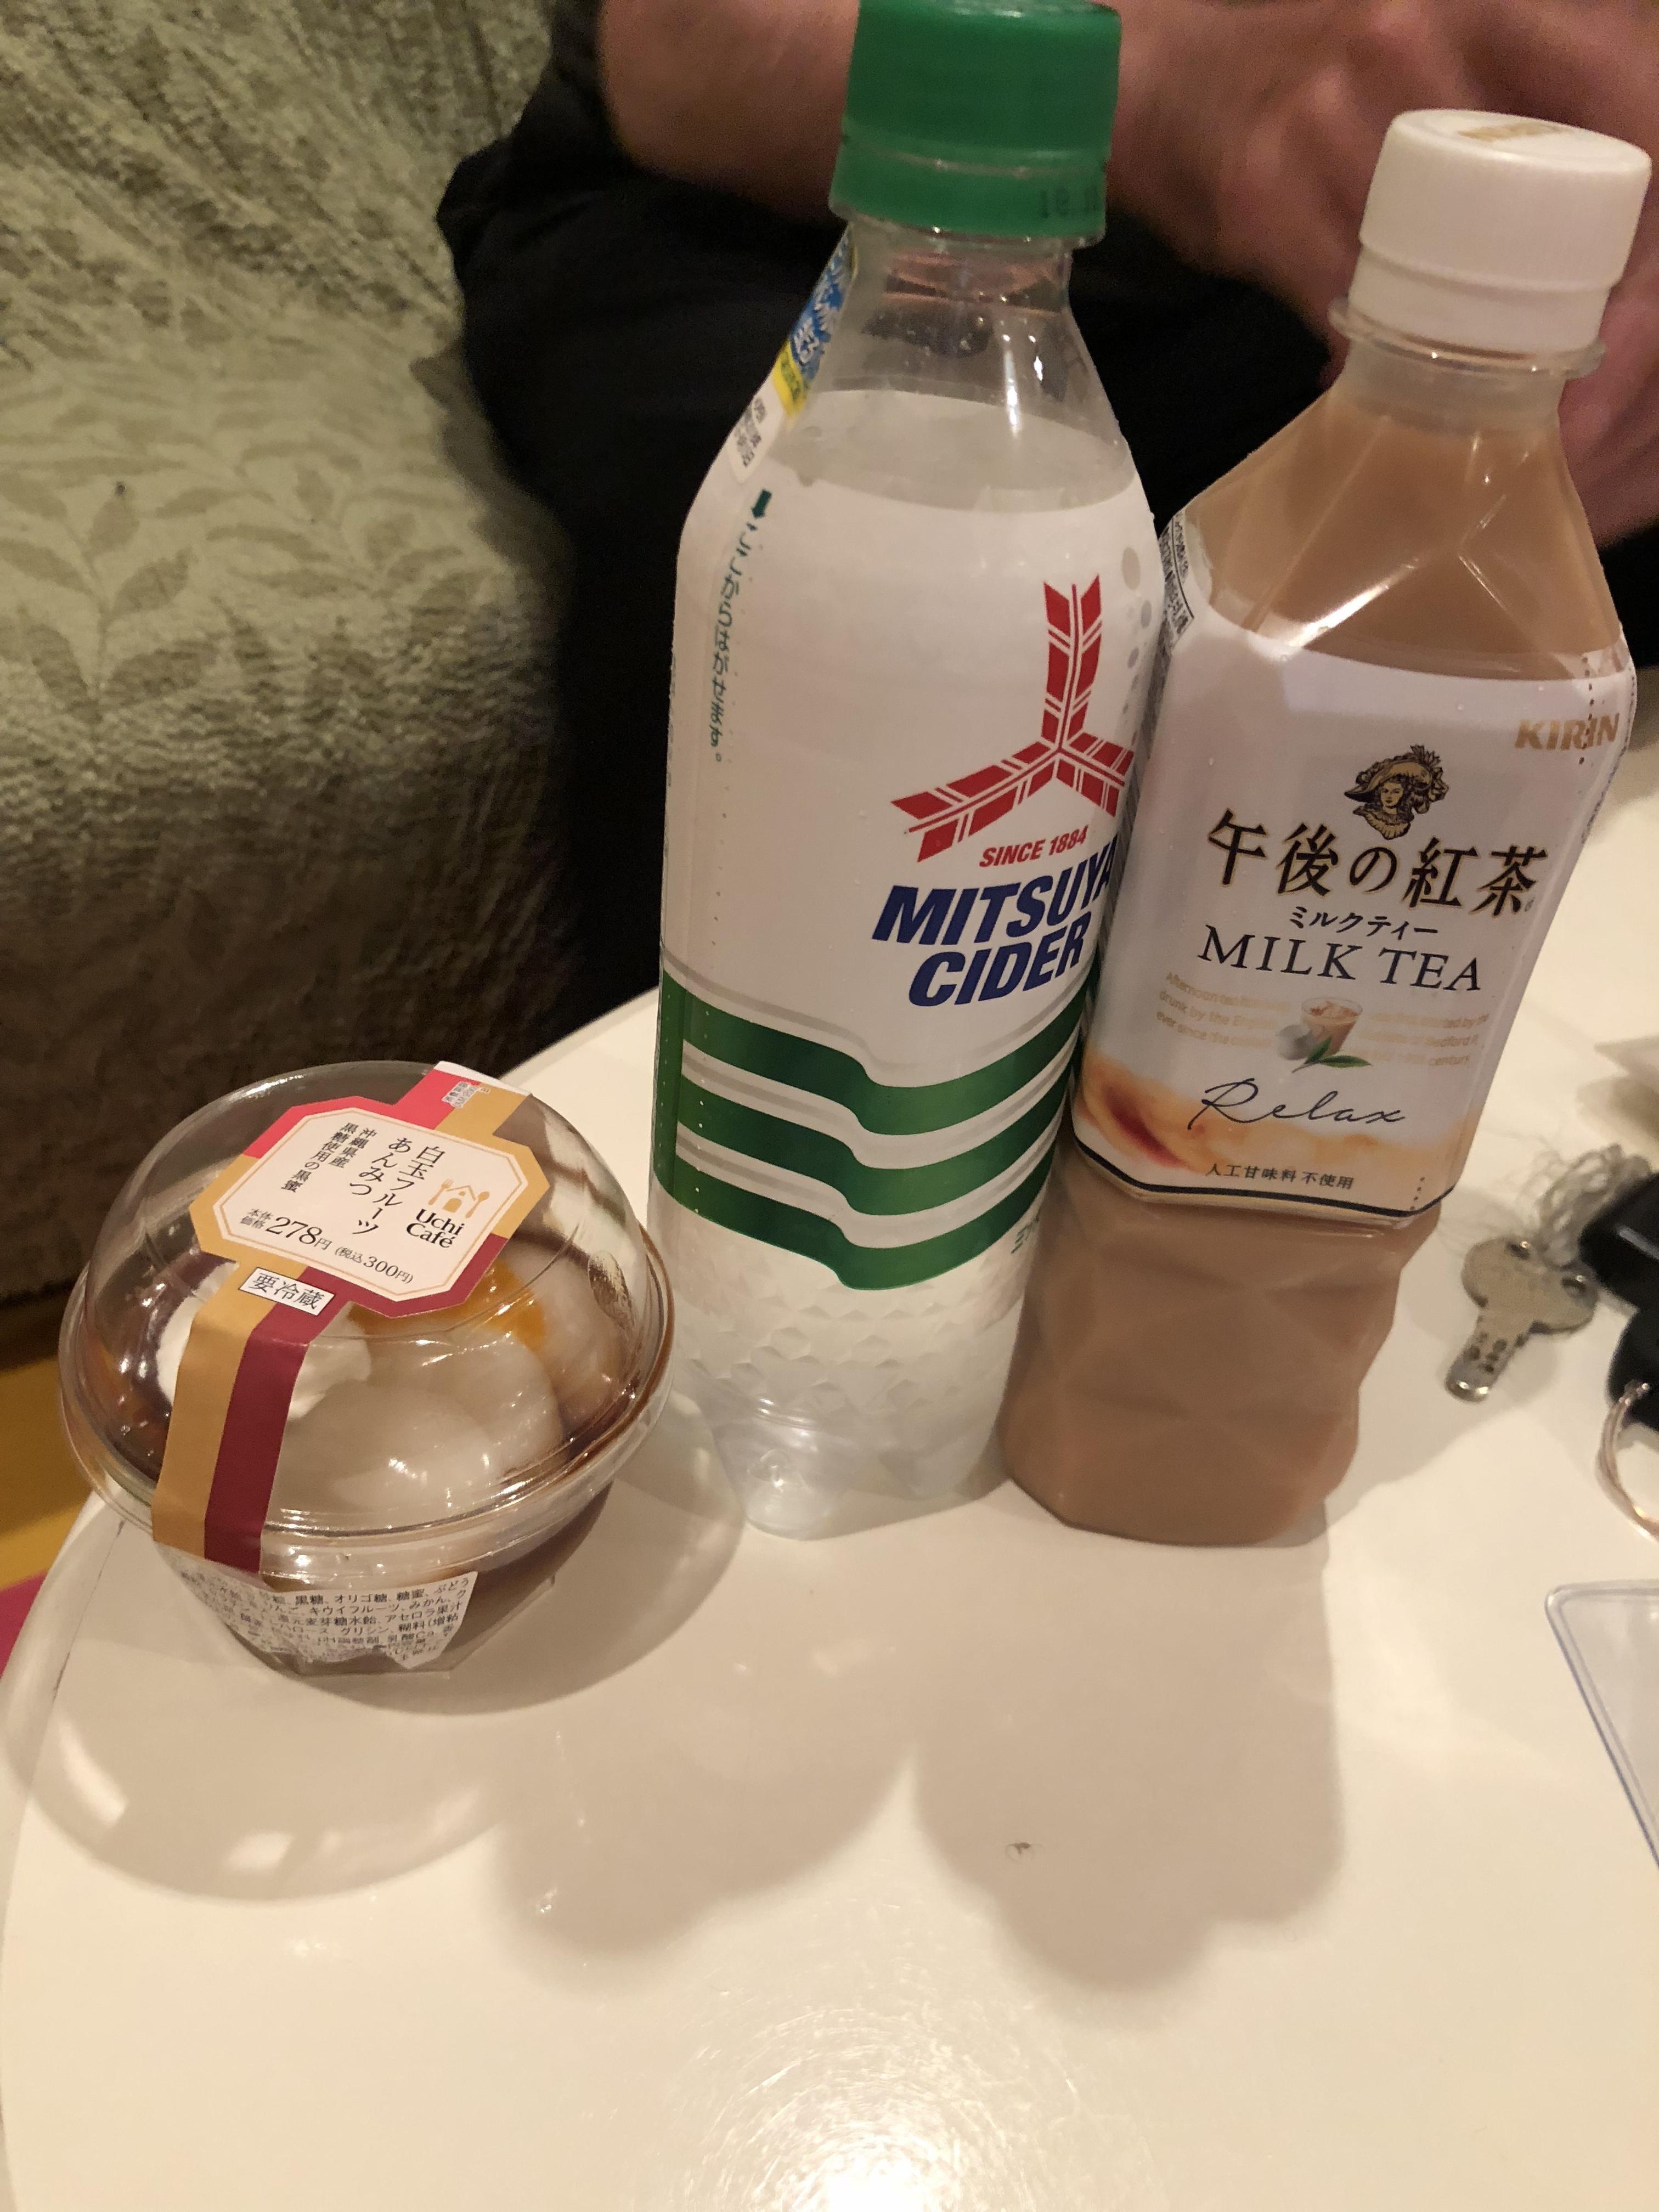 https://s3-ap-northeast-1.amazonaws.com/files.deli-fuzoku.jp/img/shop/hkadankamisu/diary/25994692/d_0_20180705153537395.jpeg